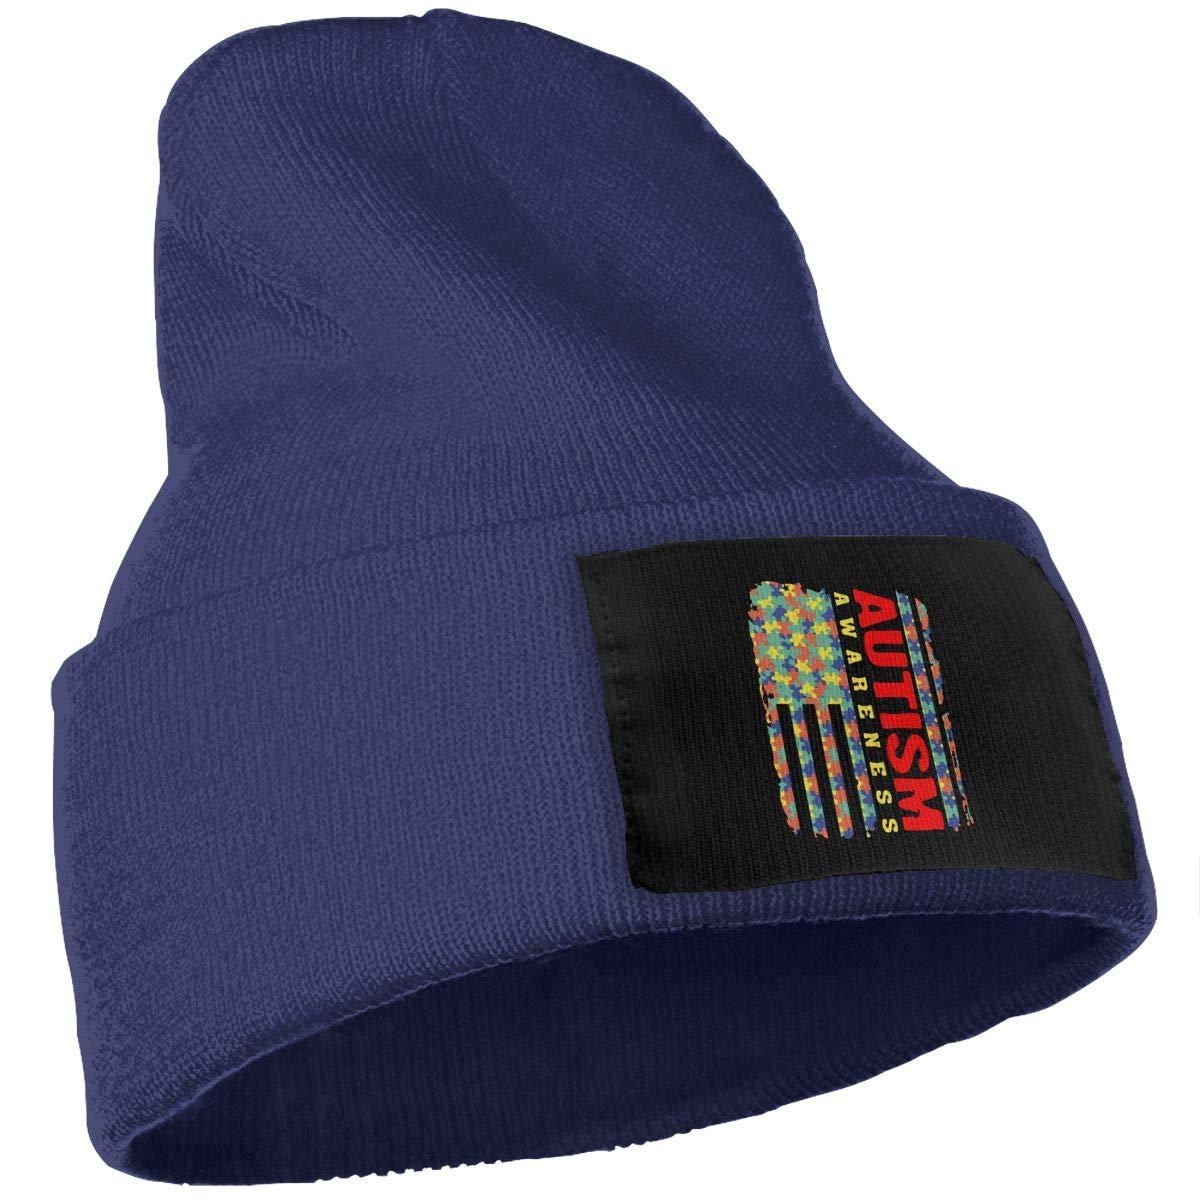 COLLJL-8 Unisex Autism Awareness Ribbon Outdoor Warm Knit Beanies Hat Soft Winter Skull Caps